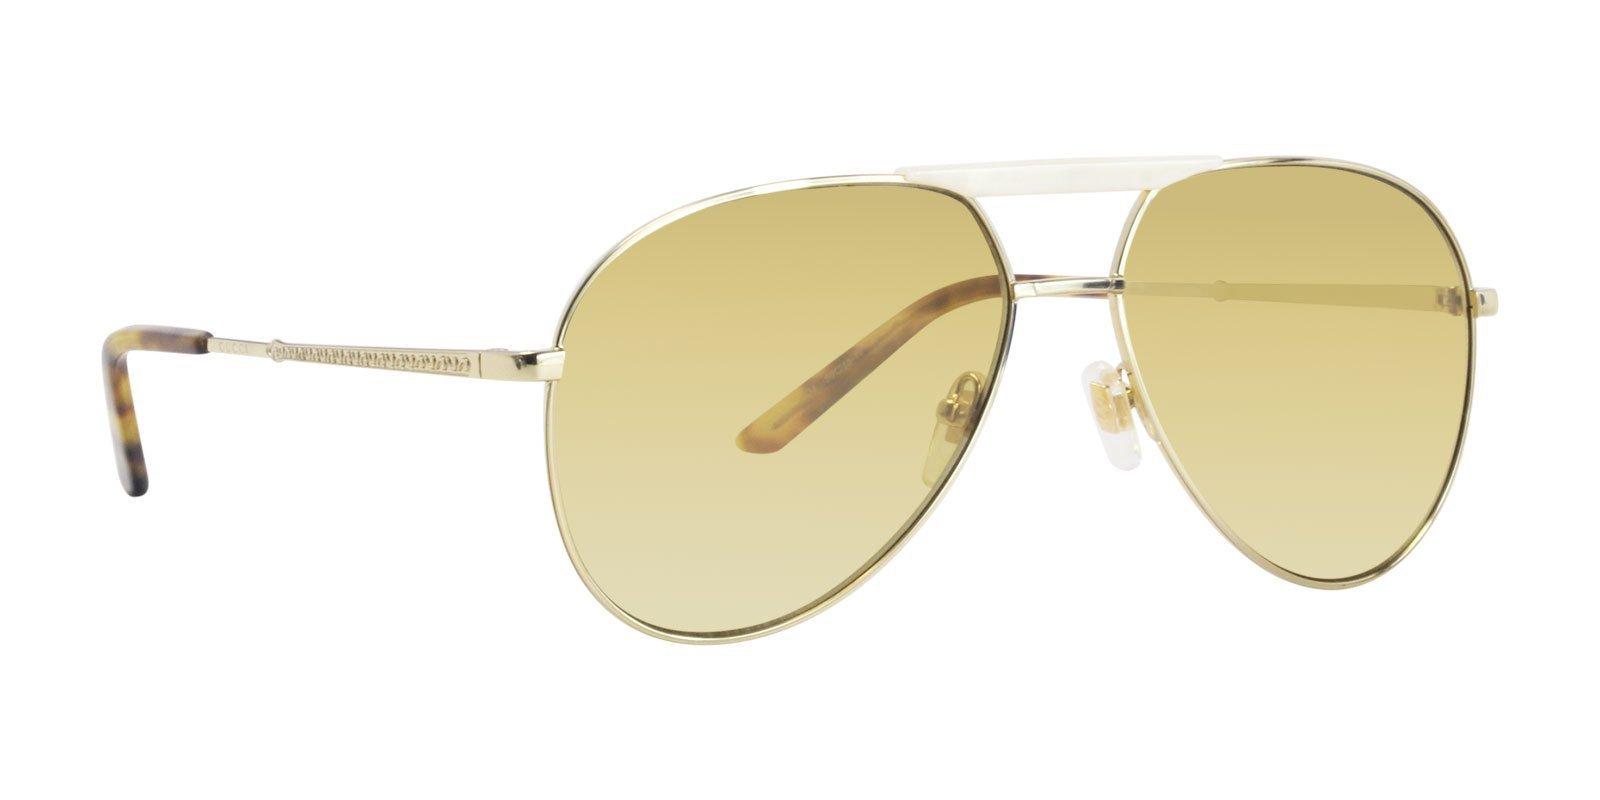 e5dc840dfb9 Gucci - GG0242S 004-sunglasses-Designer Eyes